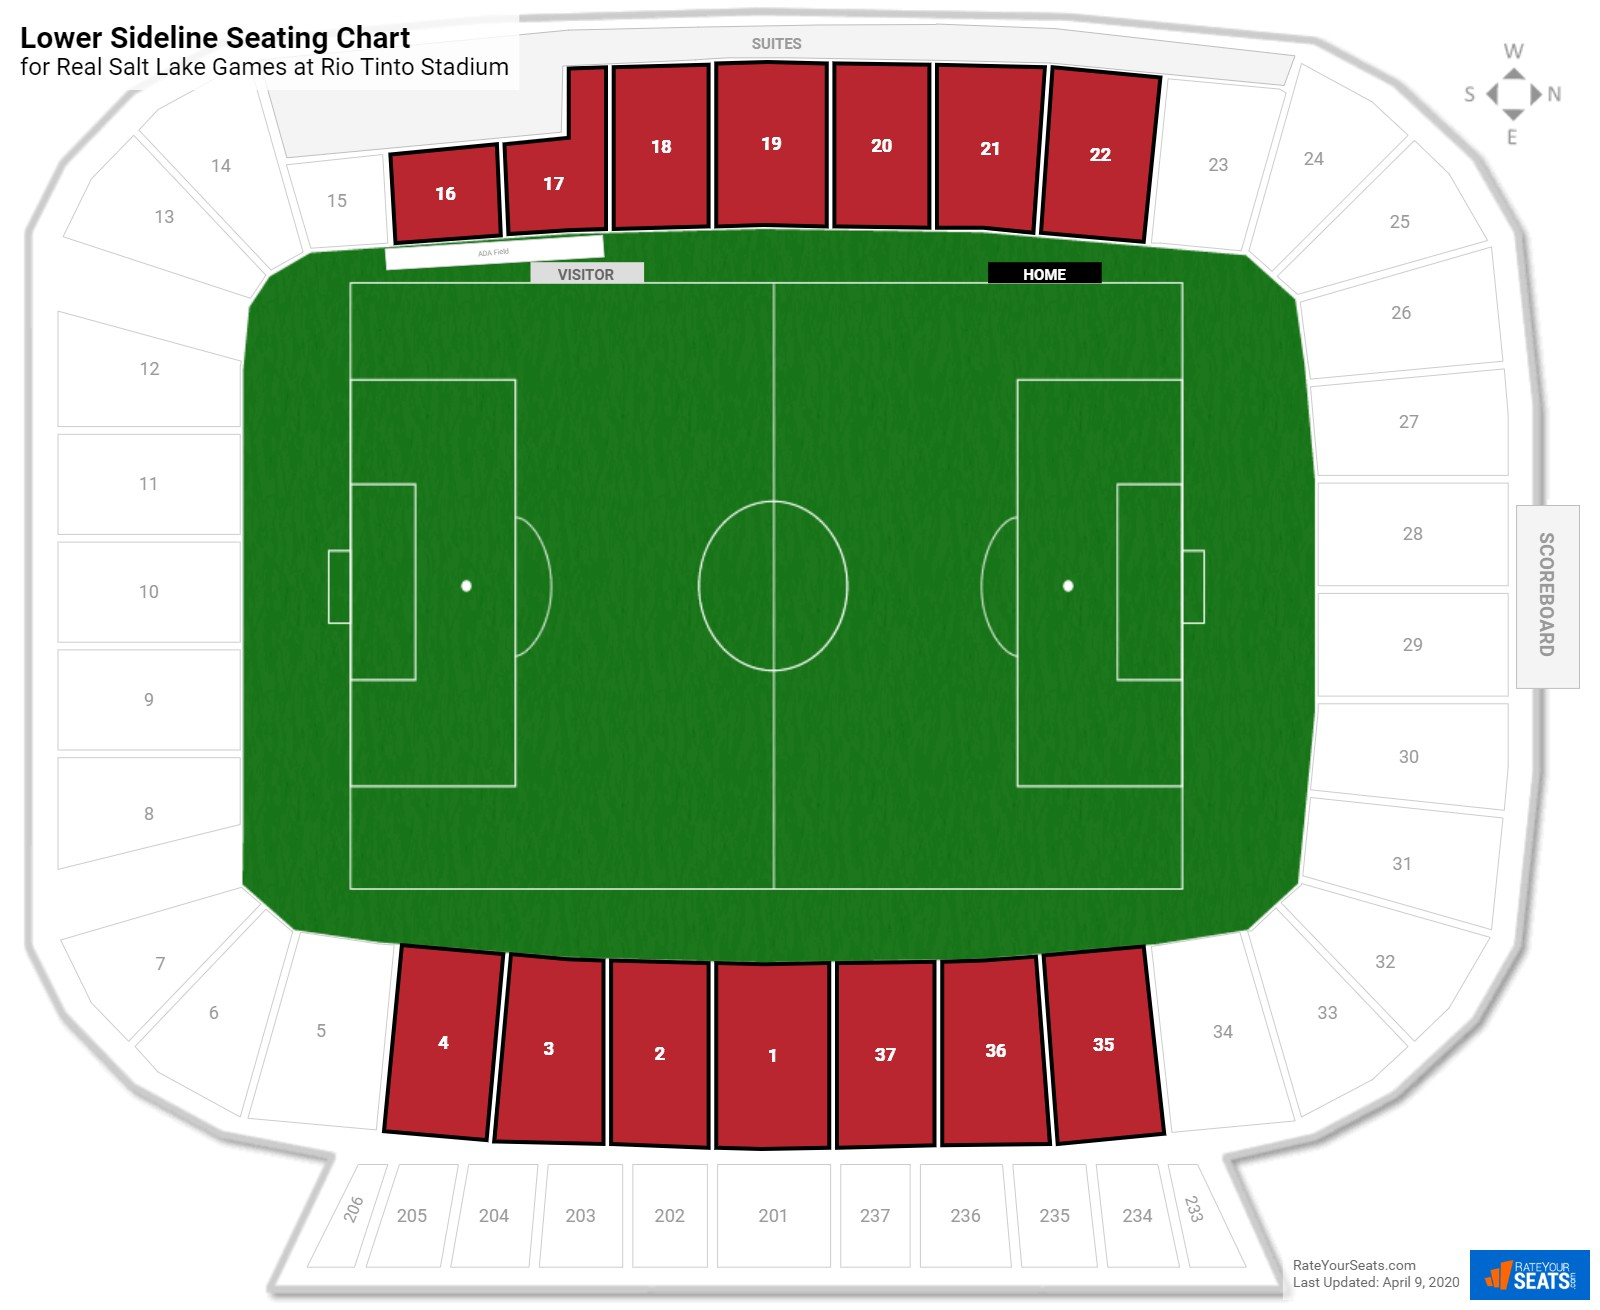 Rio Tinto Stadium Lower Sideline Seating Chart